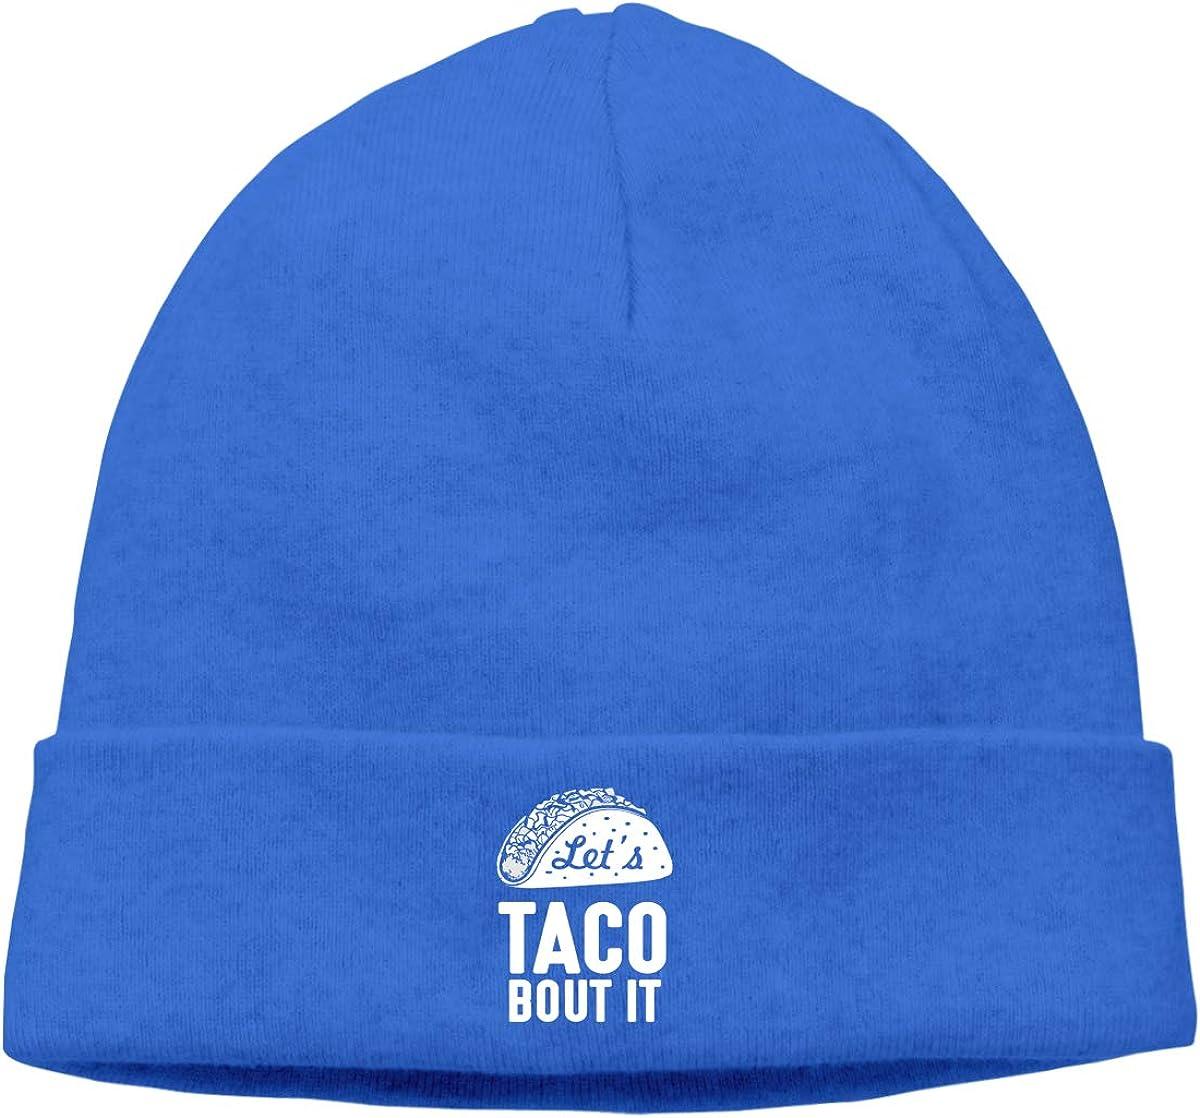 Riokk az Taco Tuesday About It Skull Cap Beanie Cap for Mens Blue